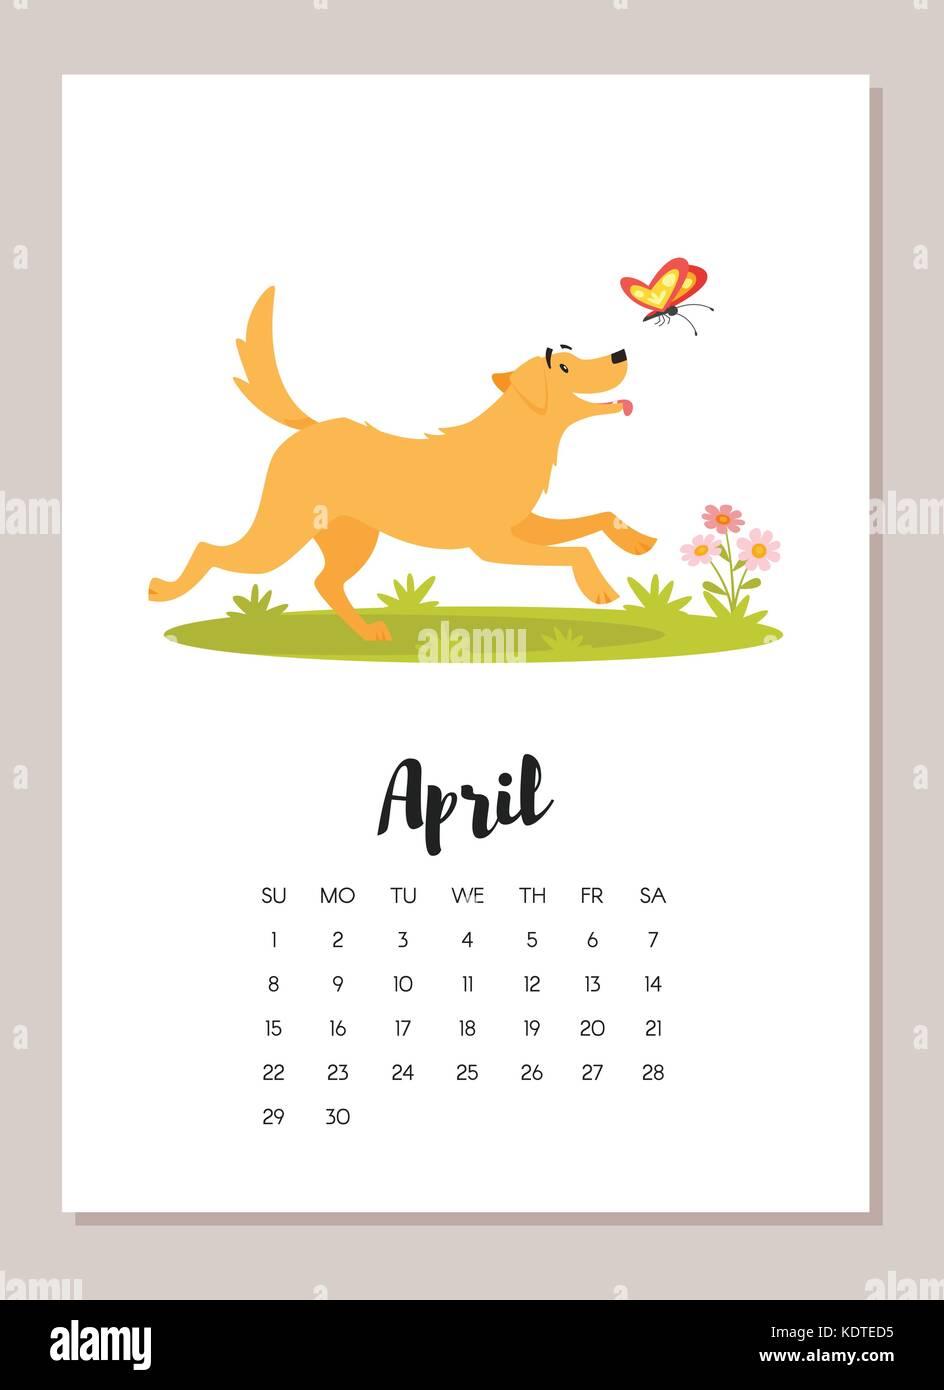 April Calendar Illustration : Vector cartoon style illustration of april dog year